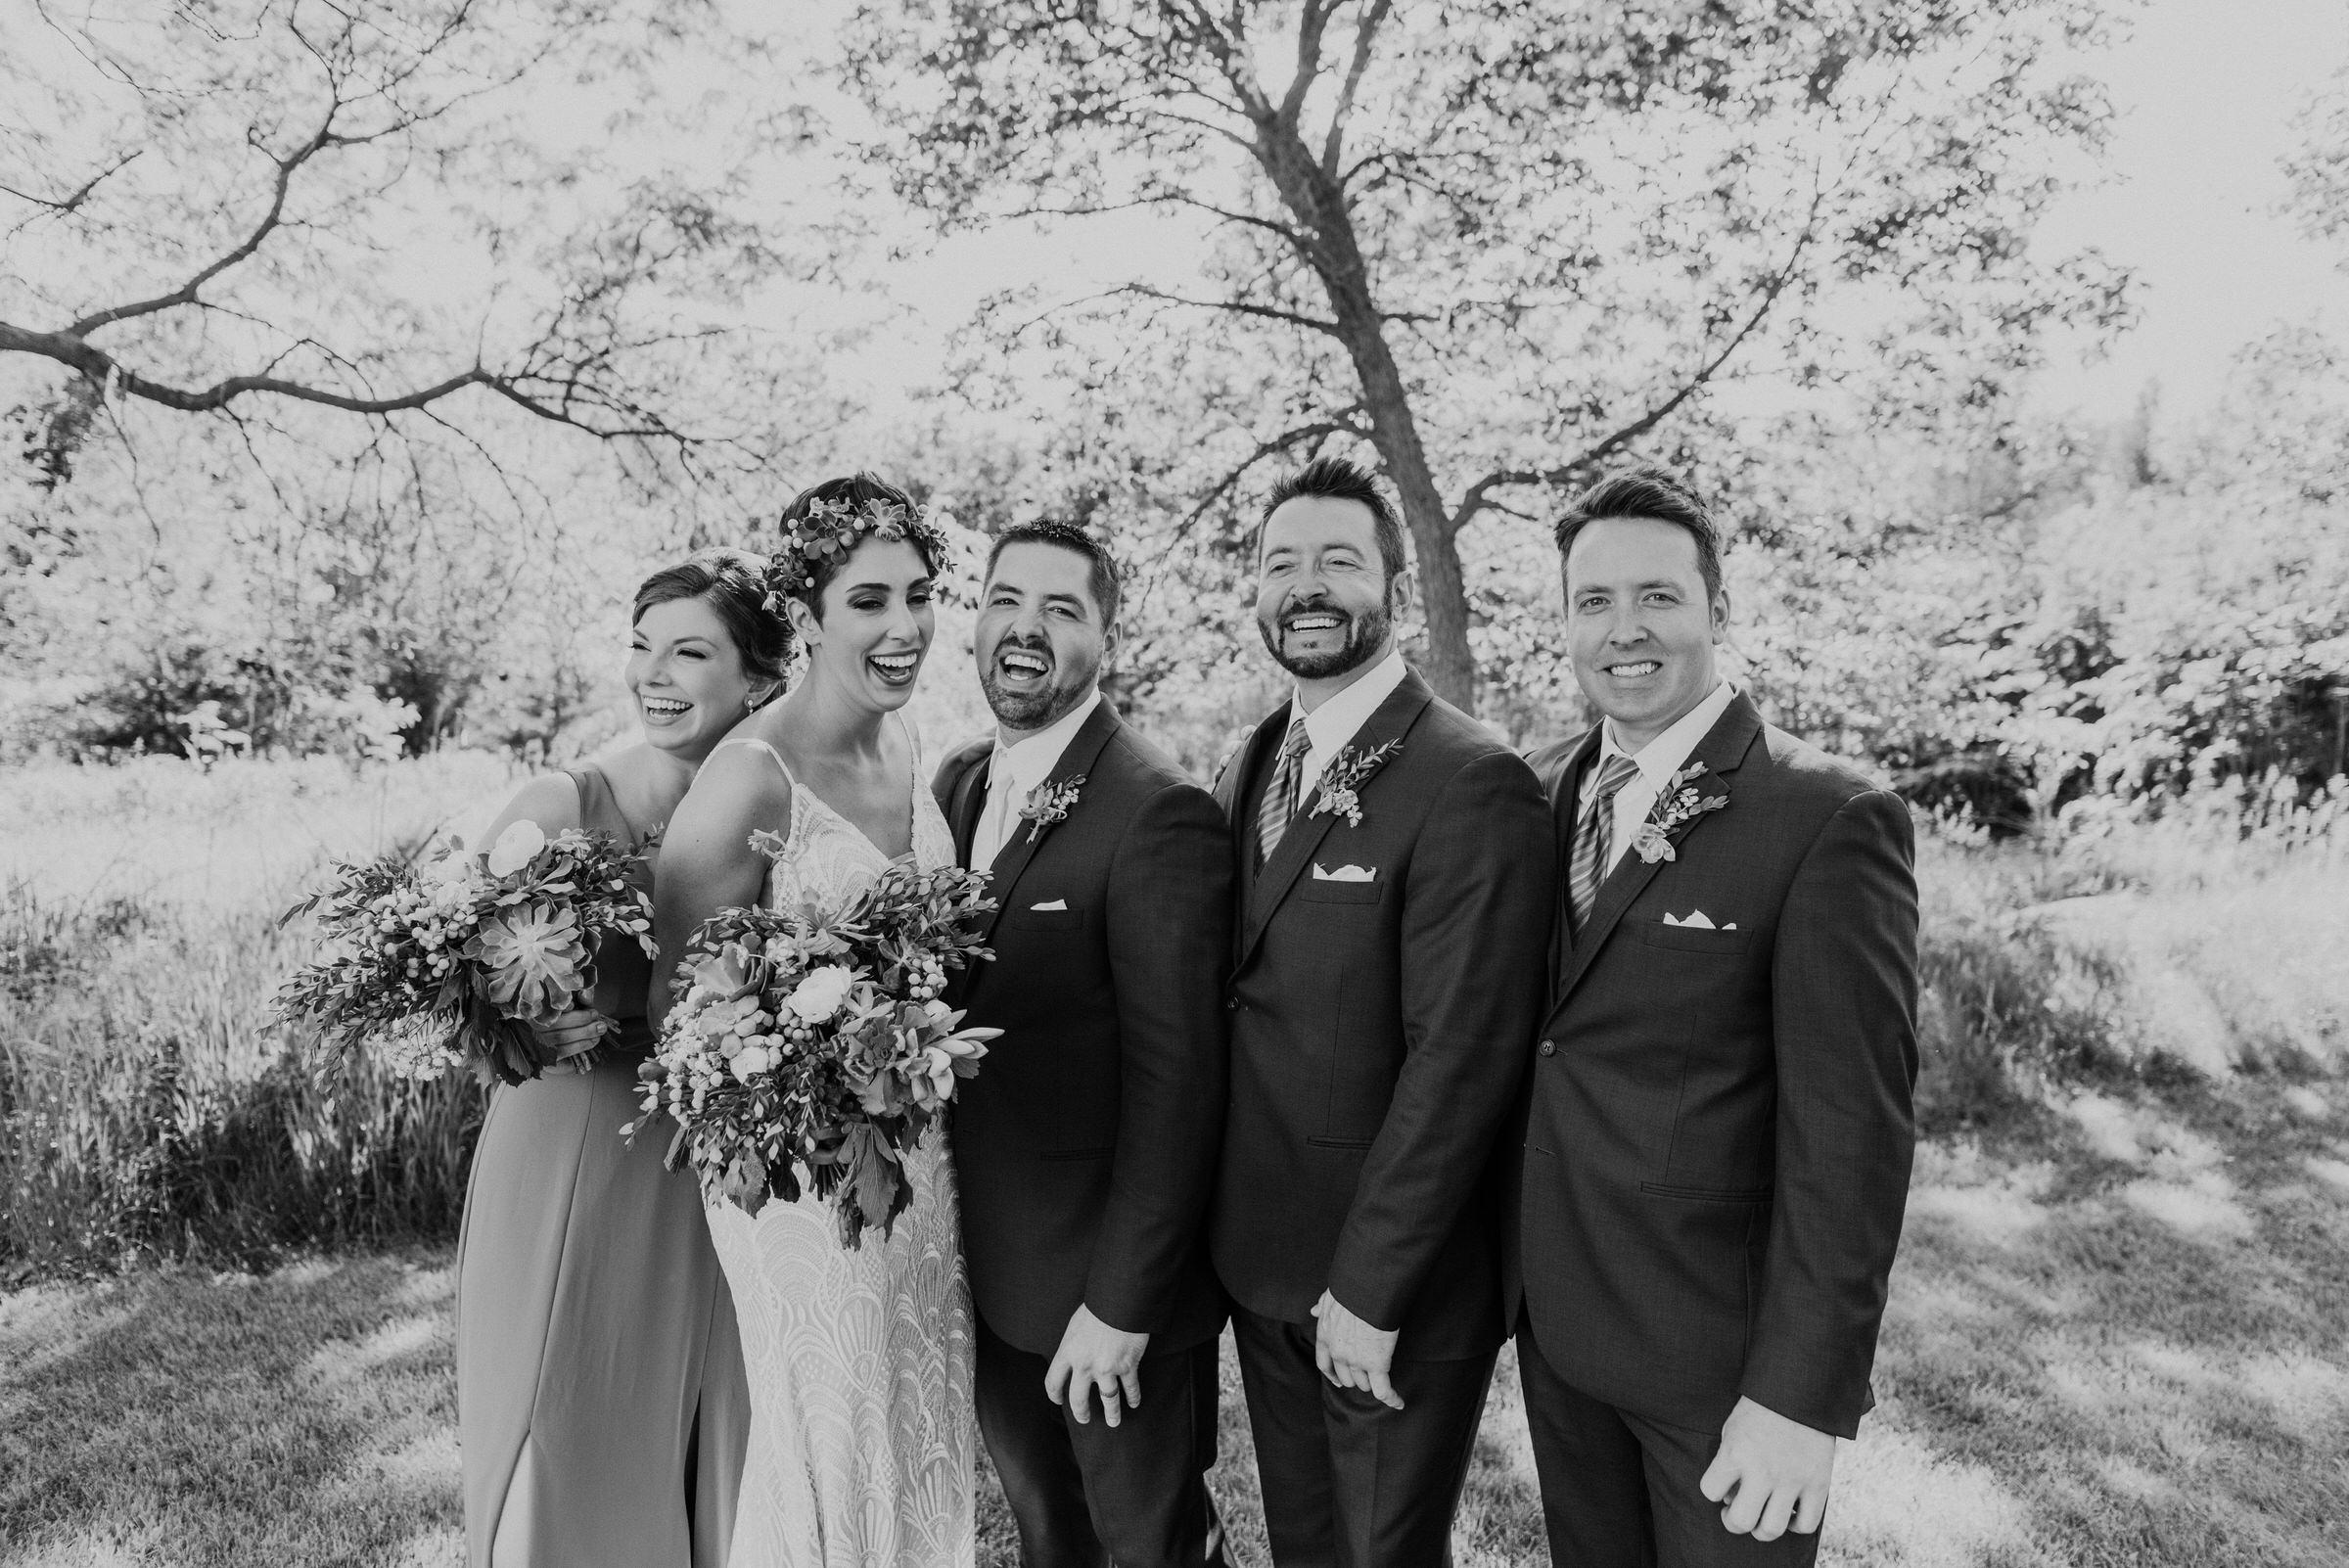 Wilderness-Ridge-Lincoln-Nebraska-Wedding-Kaylie-Sirek-Photography-068.jpg